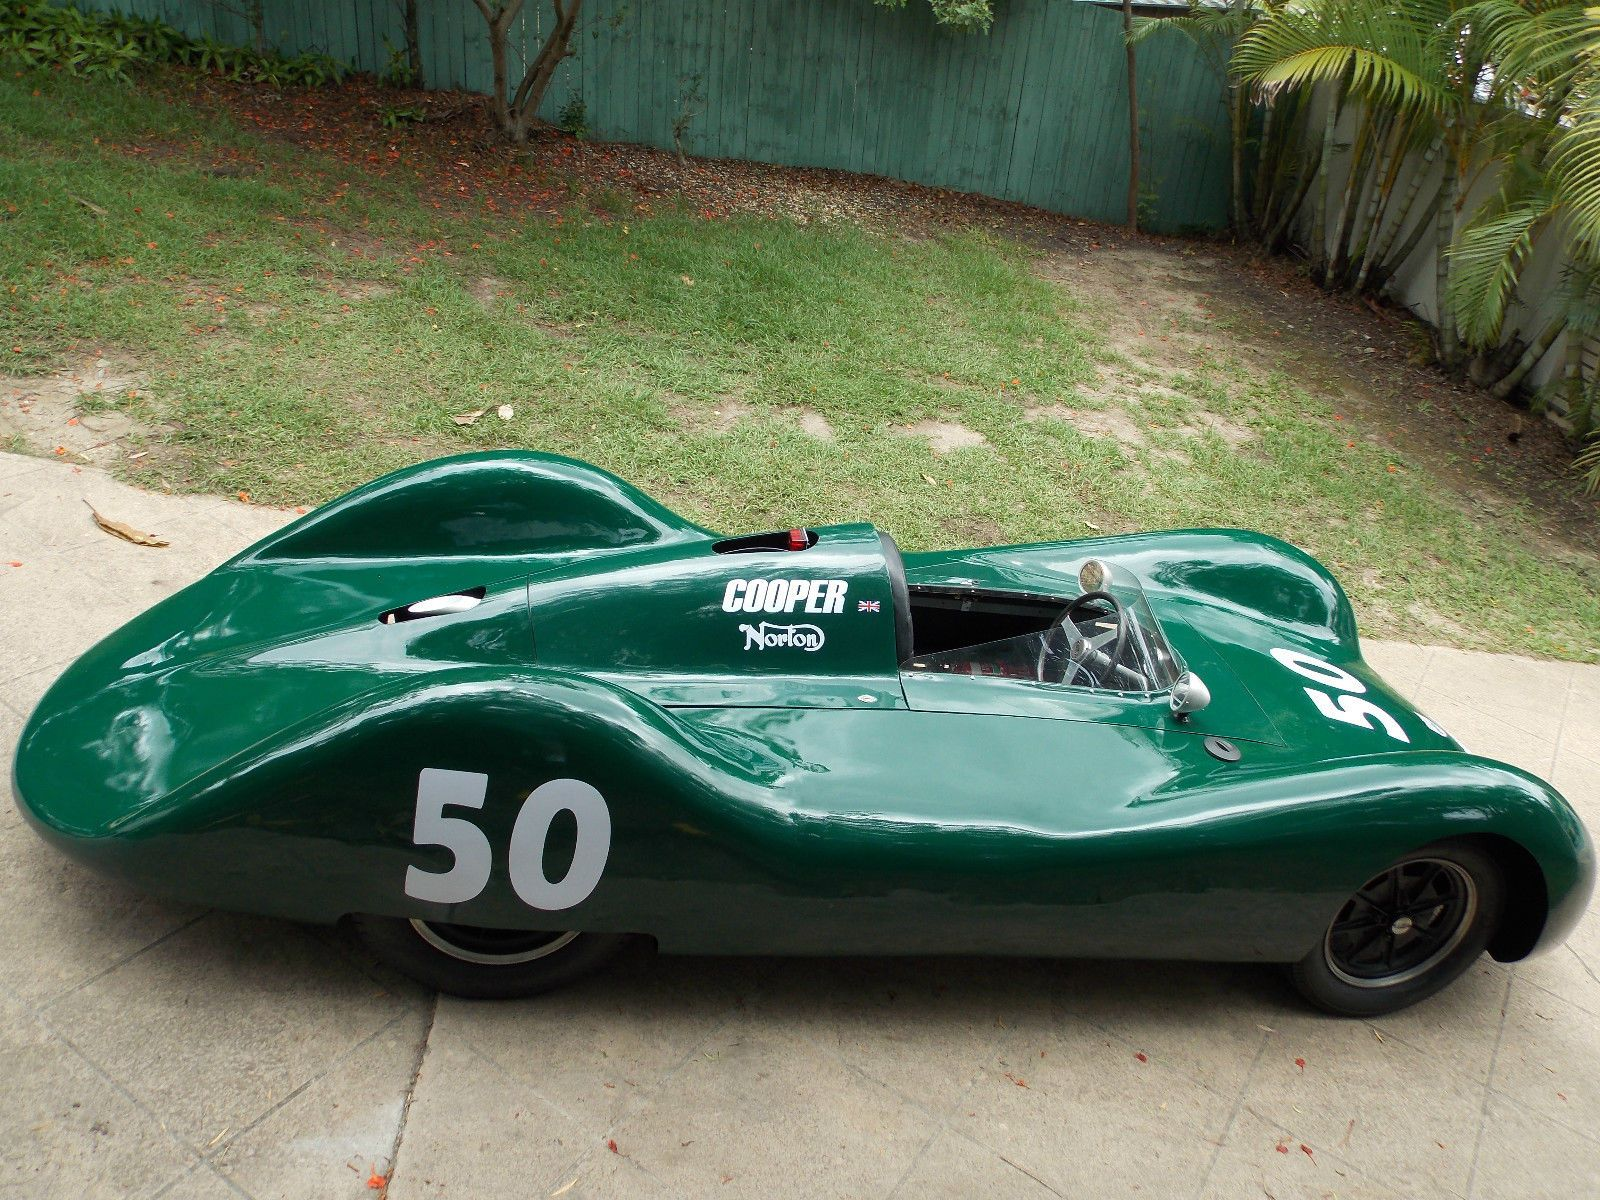 Cooper MK4 Type 11 Race CAR 1950 Streamliner F500 F3 Manx Engine in ...